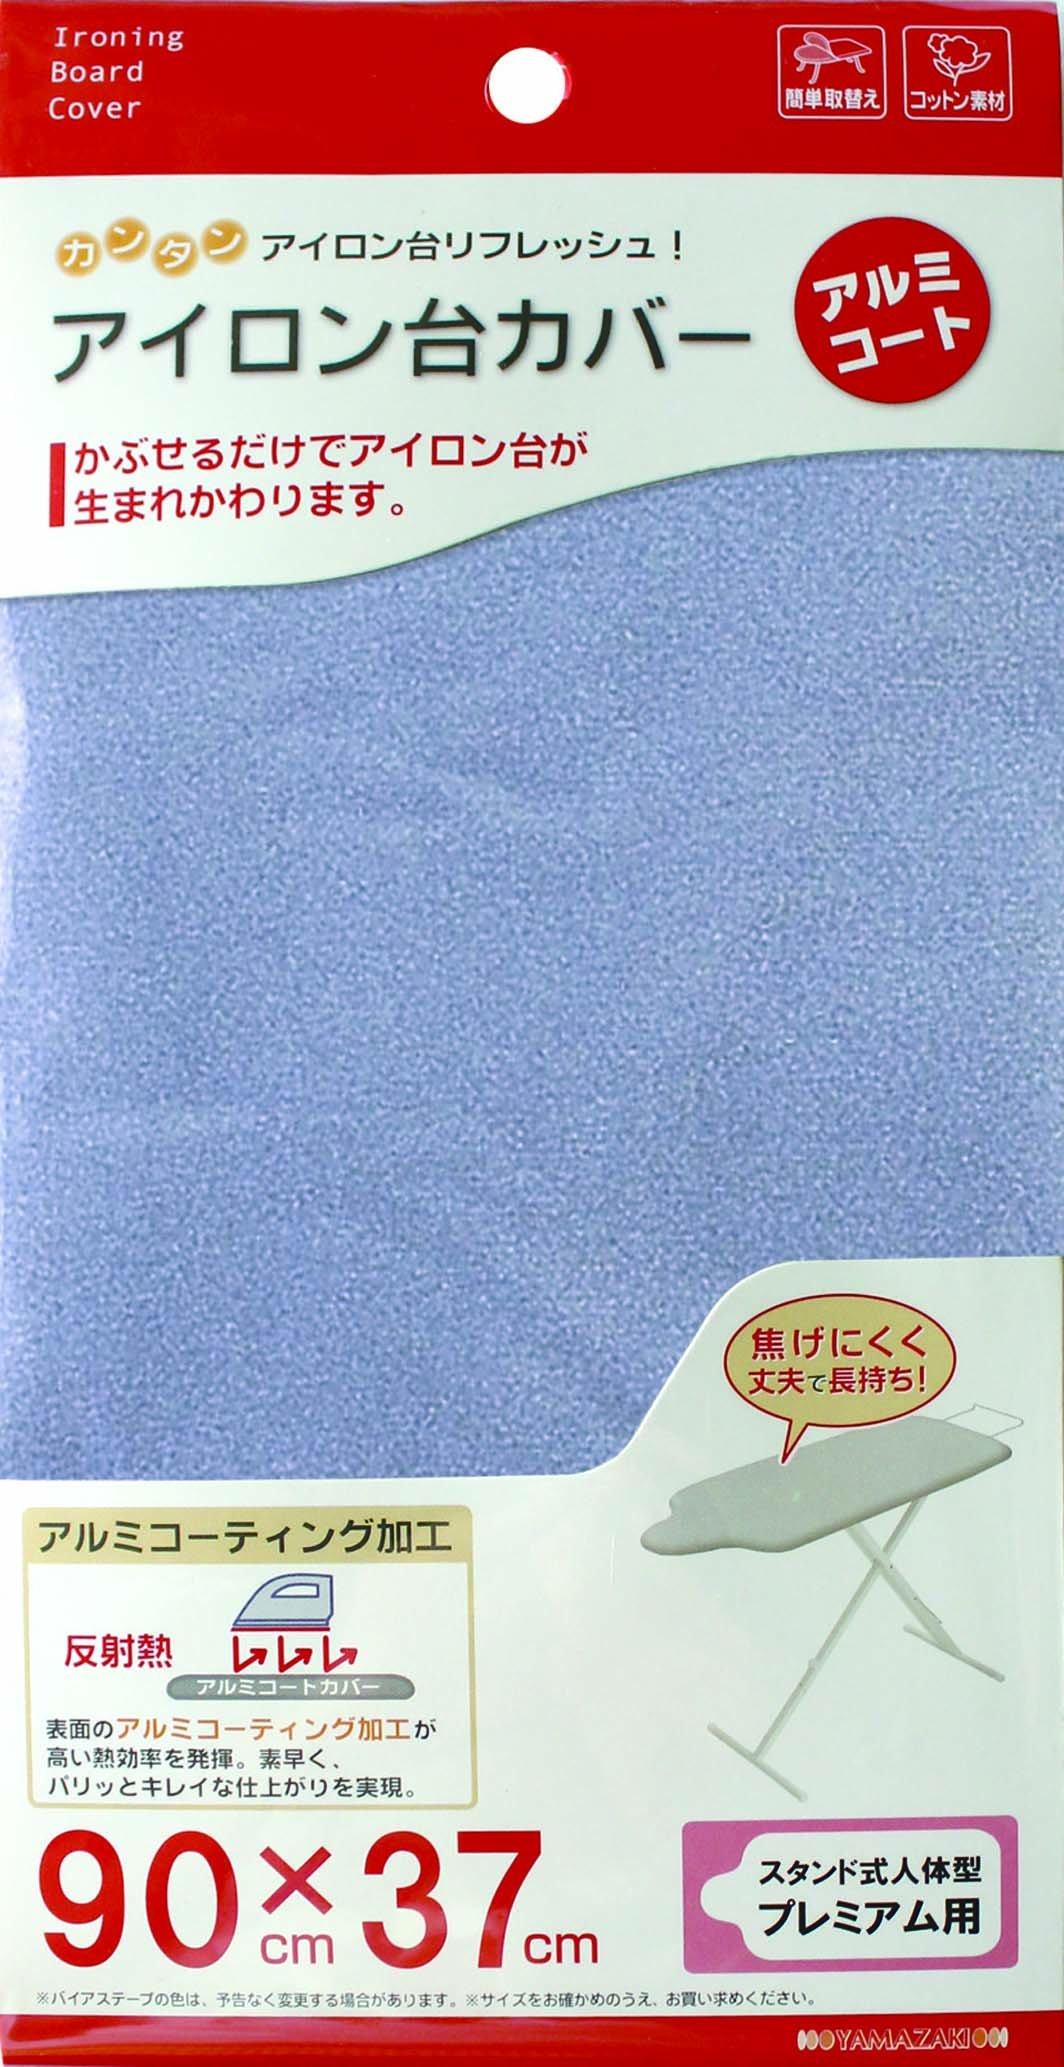 Yamazaki 山崎実業 カバースタンド式人体型プレミアム アルミコート 4607